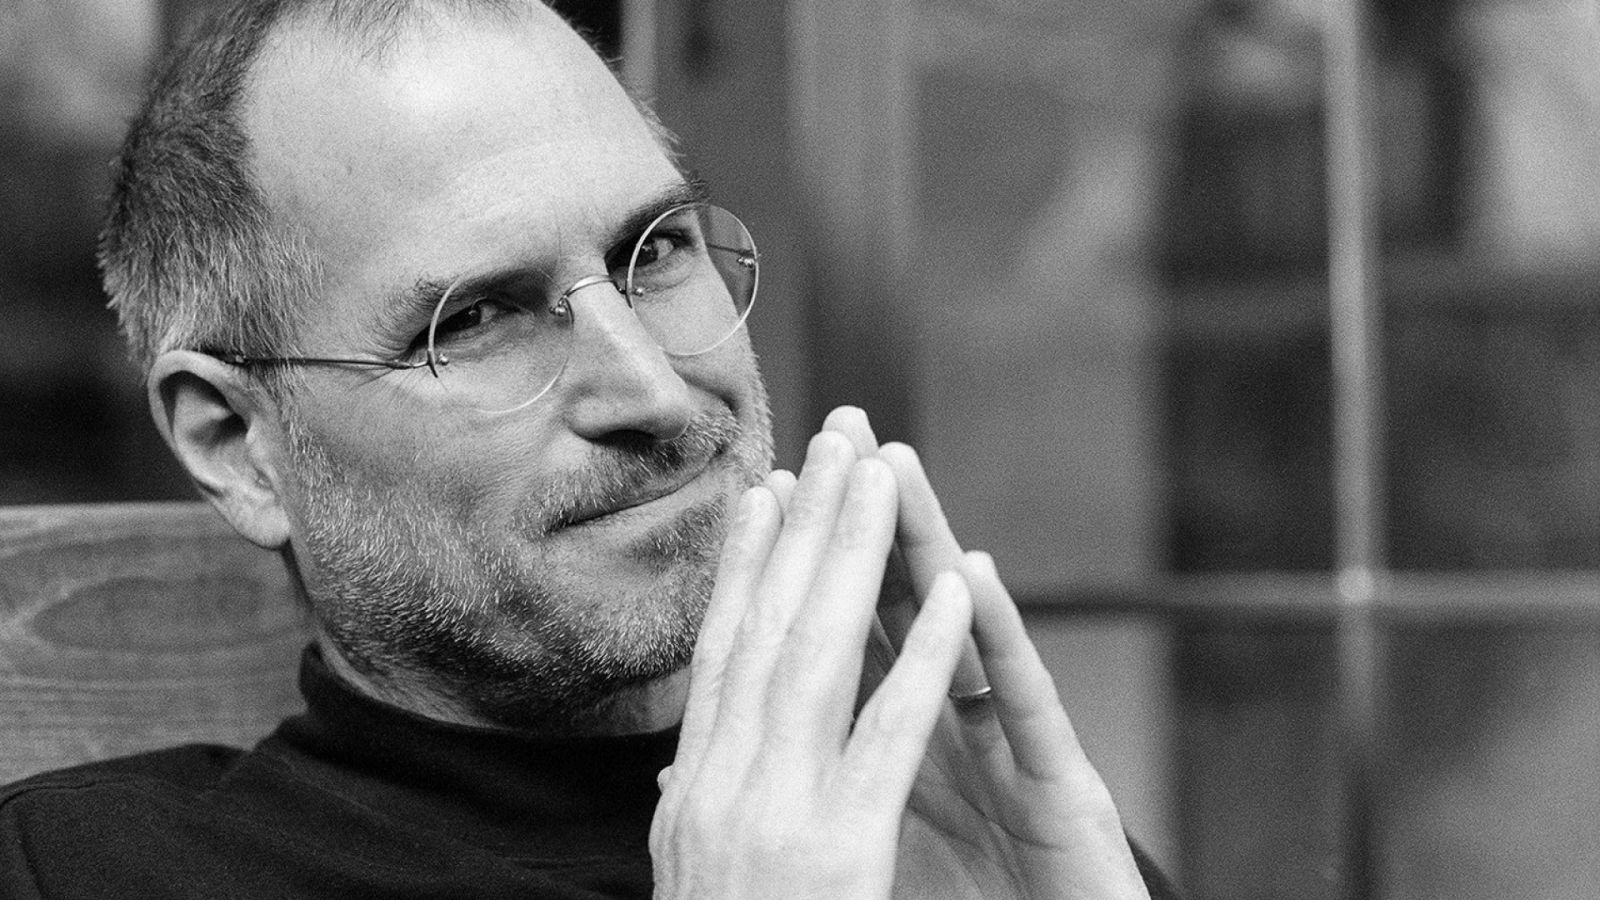 лицо компании Apple